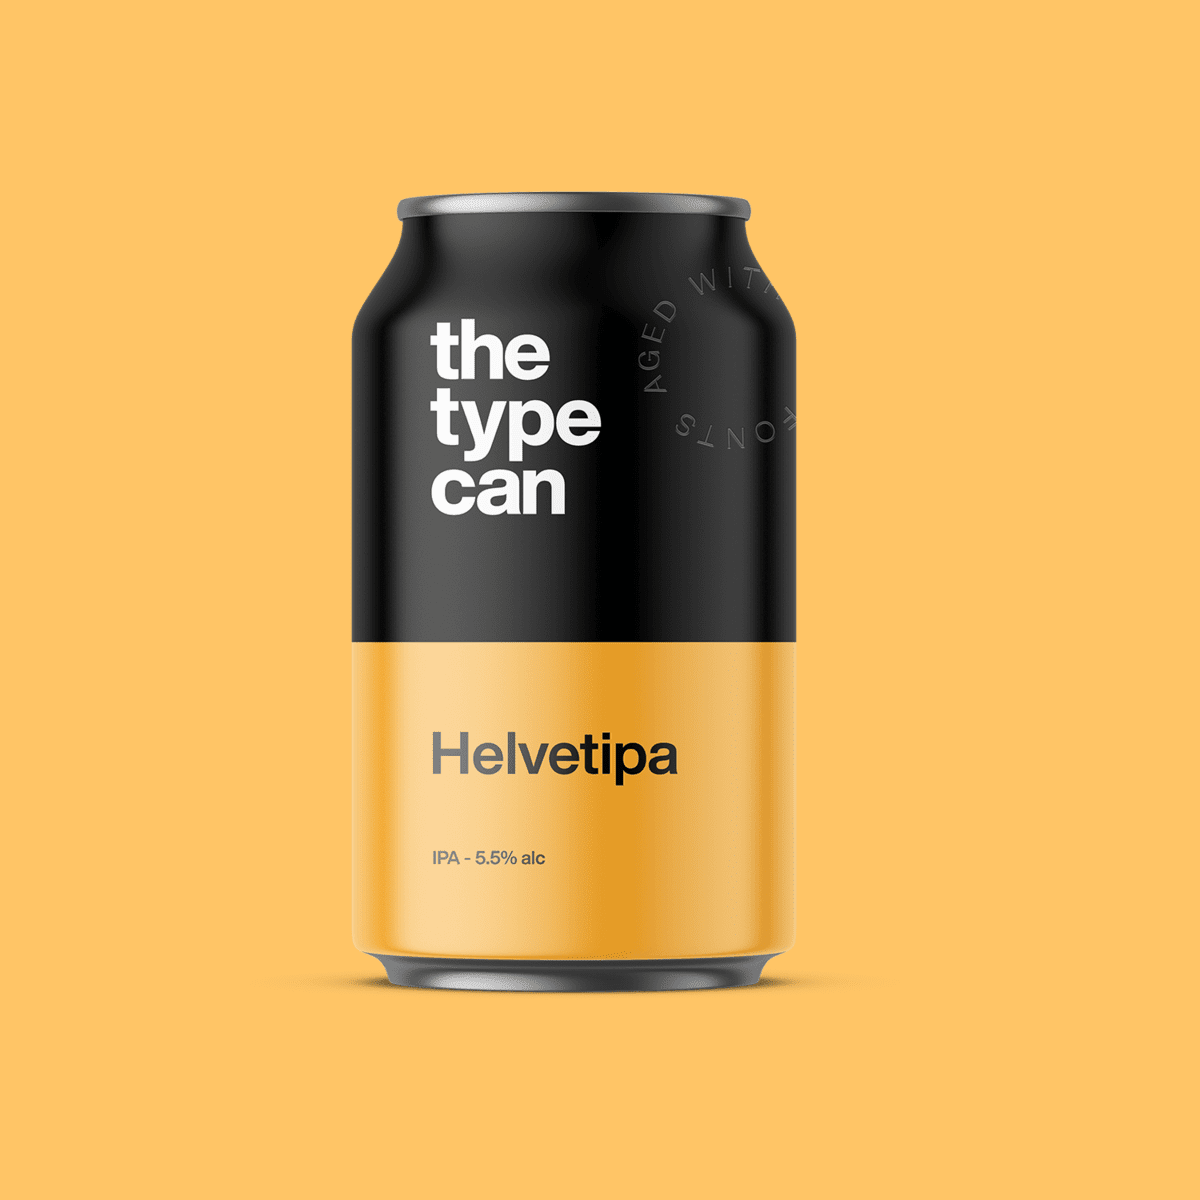 Thetypecan 4 - Obal piva pro milovníky typografie